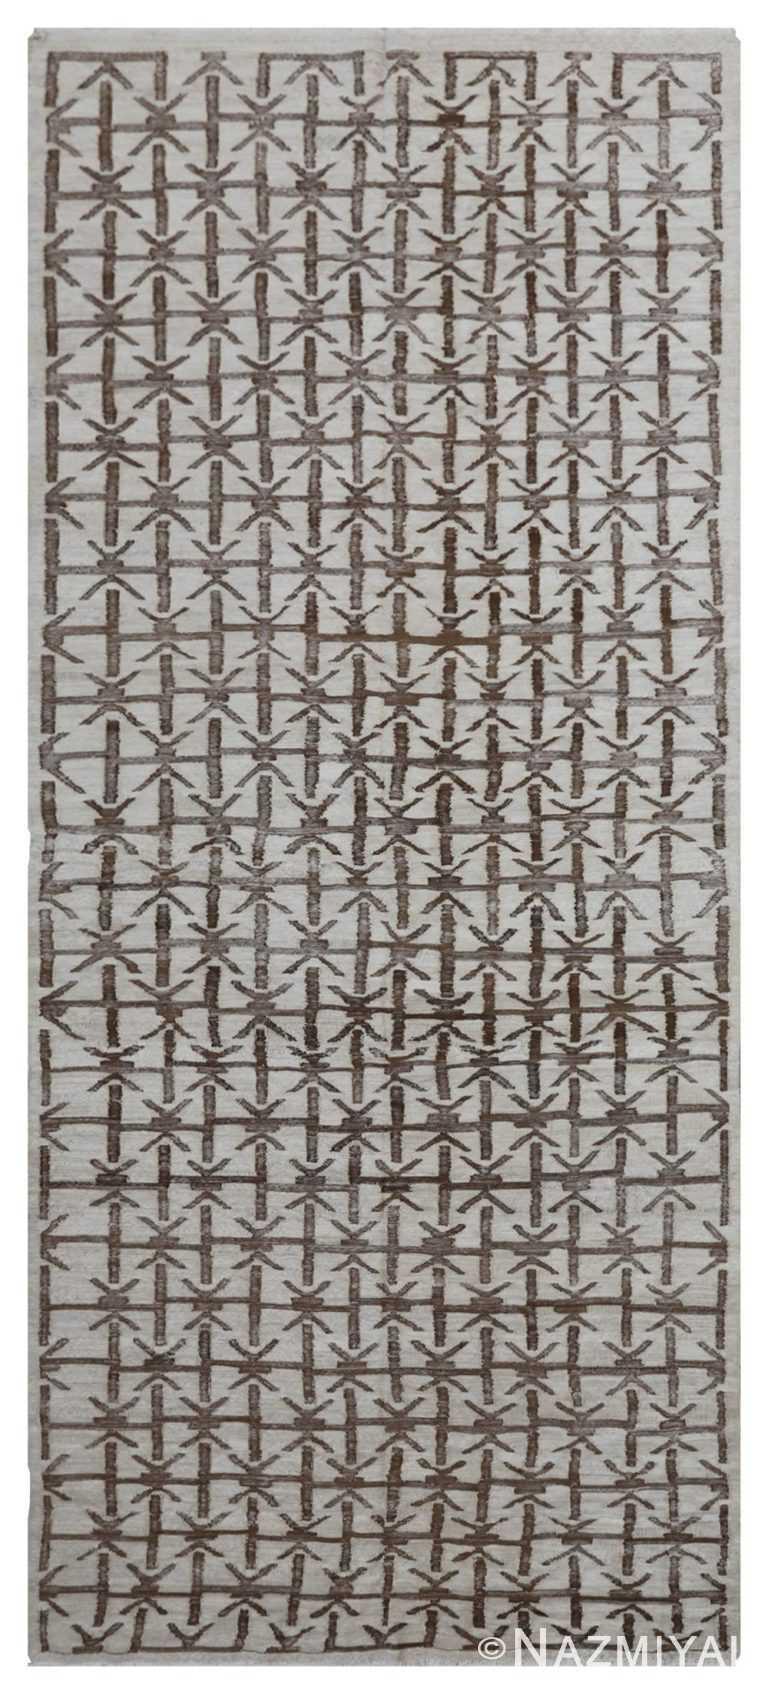 Modern Flat Weave Rug 801459260 by Nazmiyal NYC